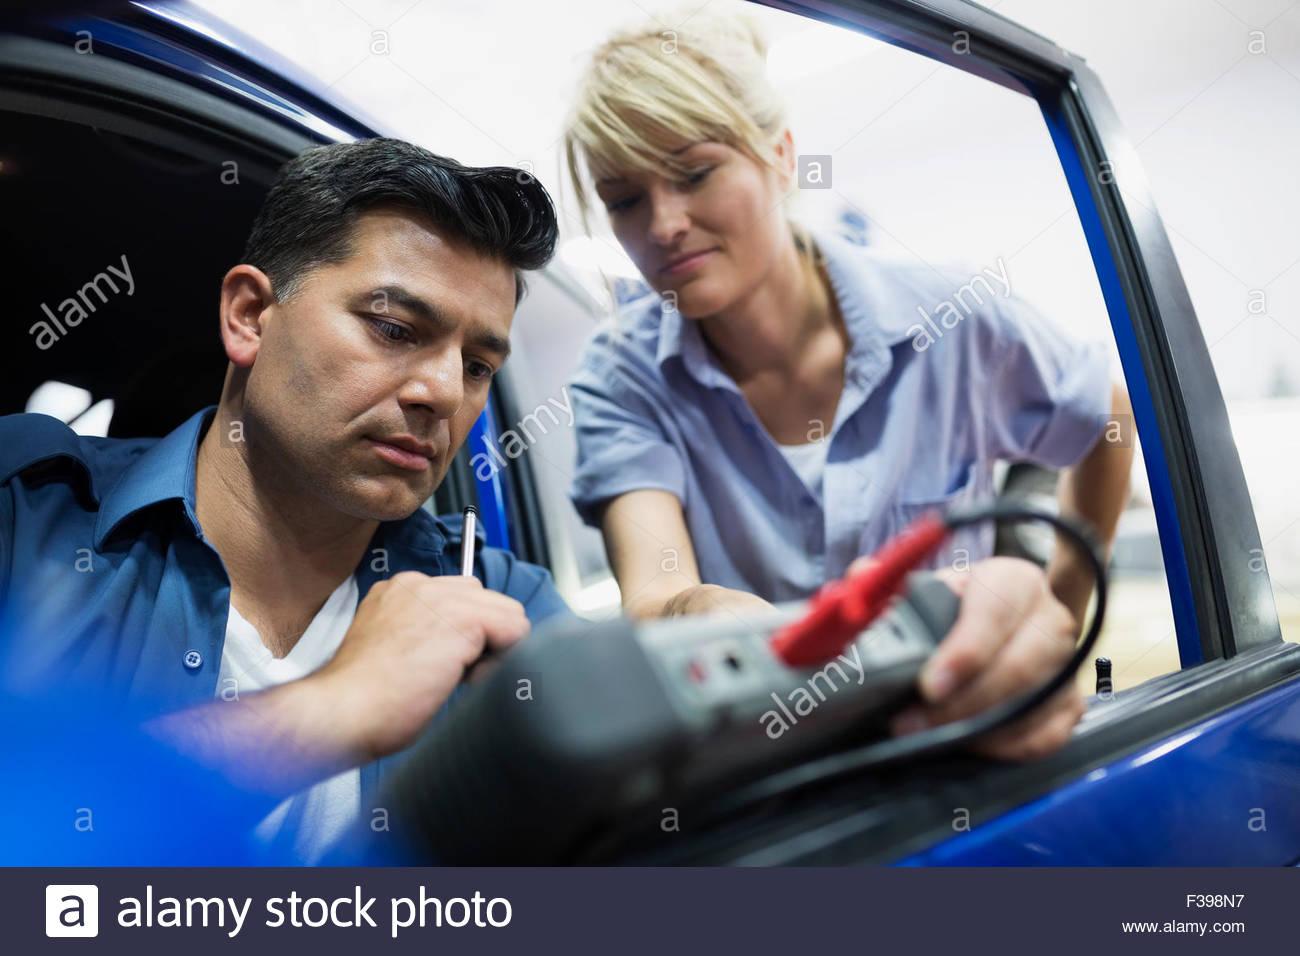 Mechanics diagnostic testing car in auto repair shop - Stock Image